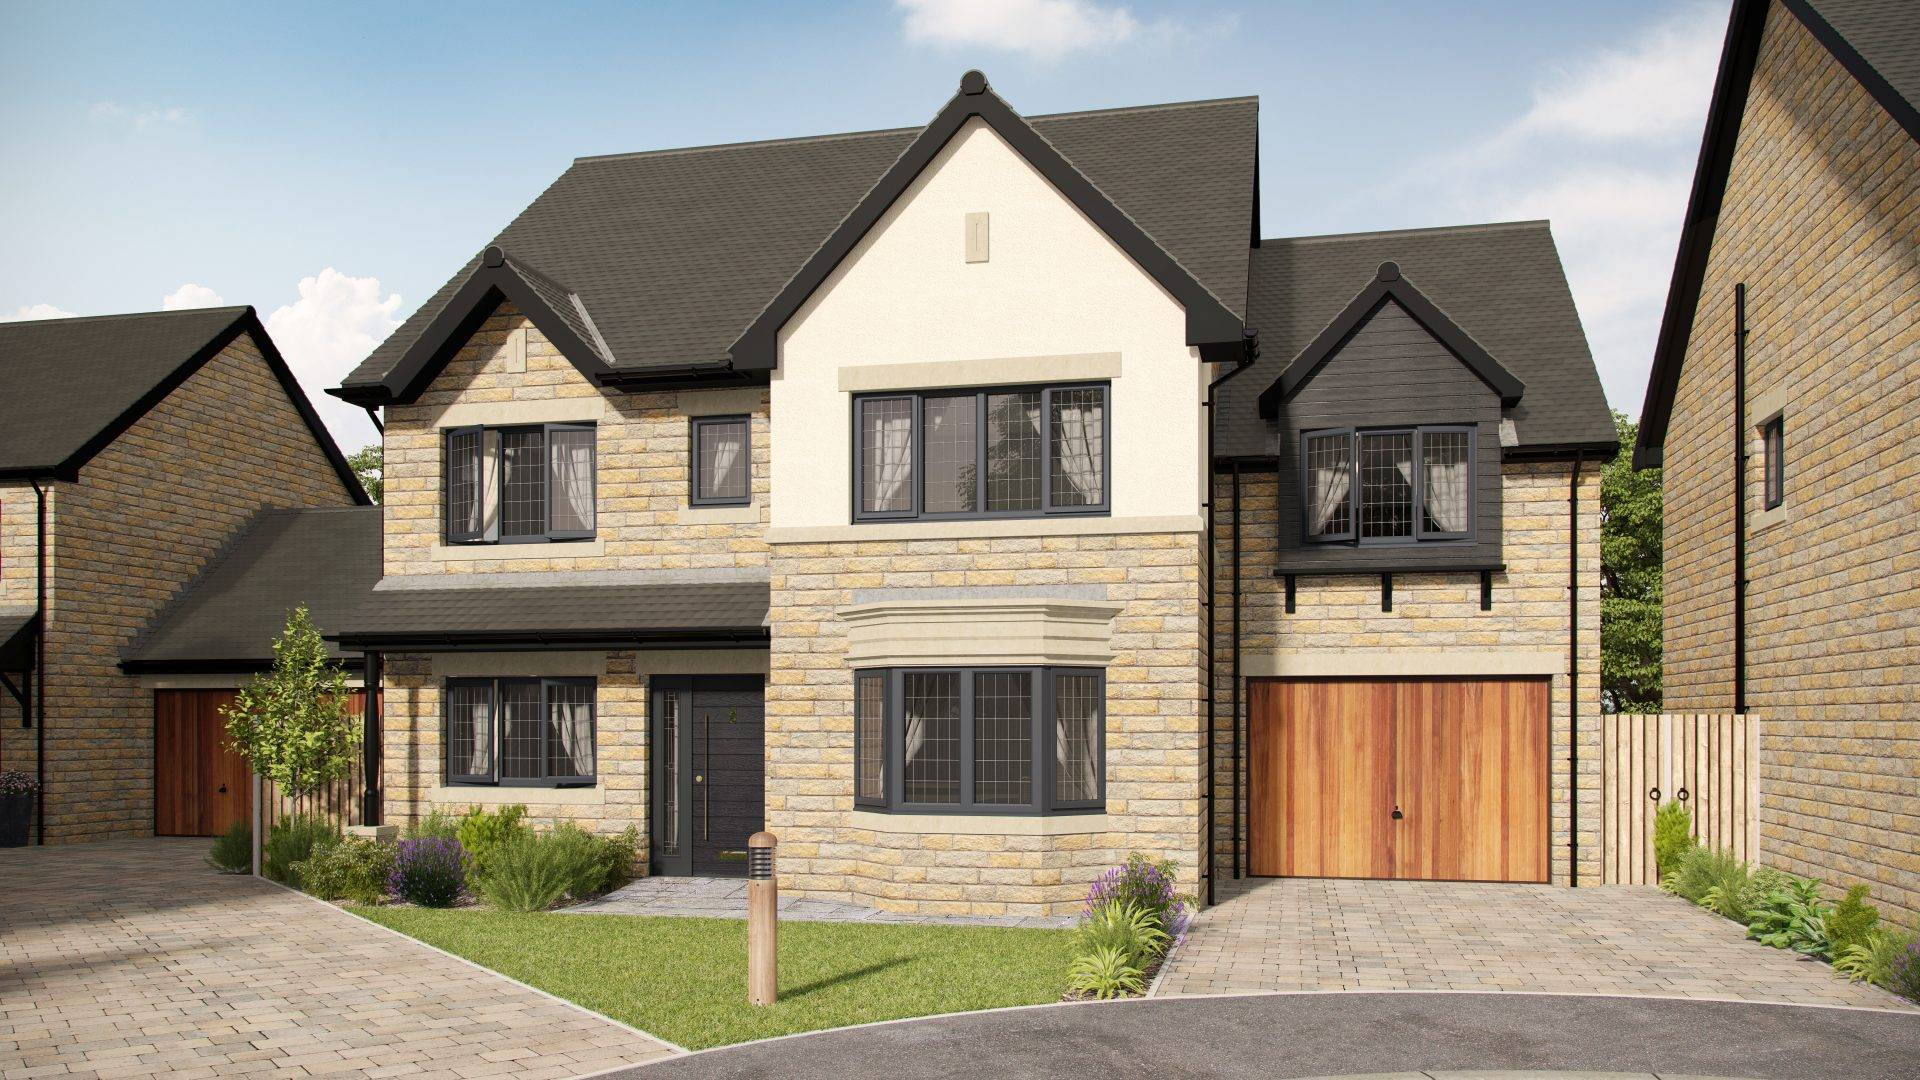 Hardwick - Wyre Grange